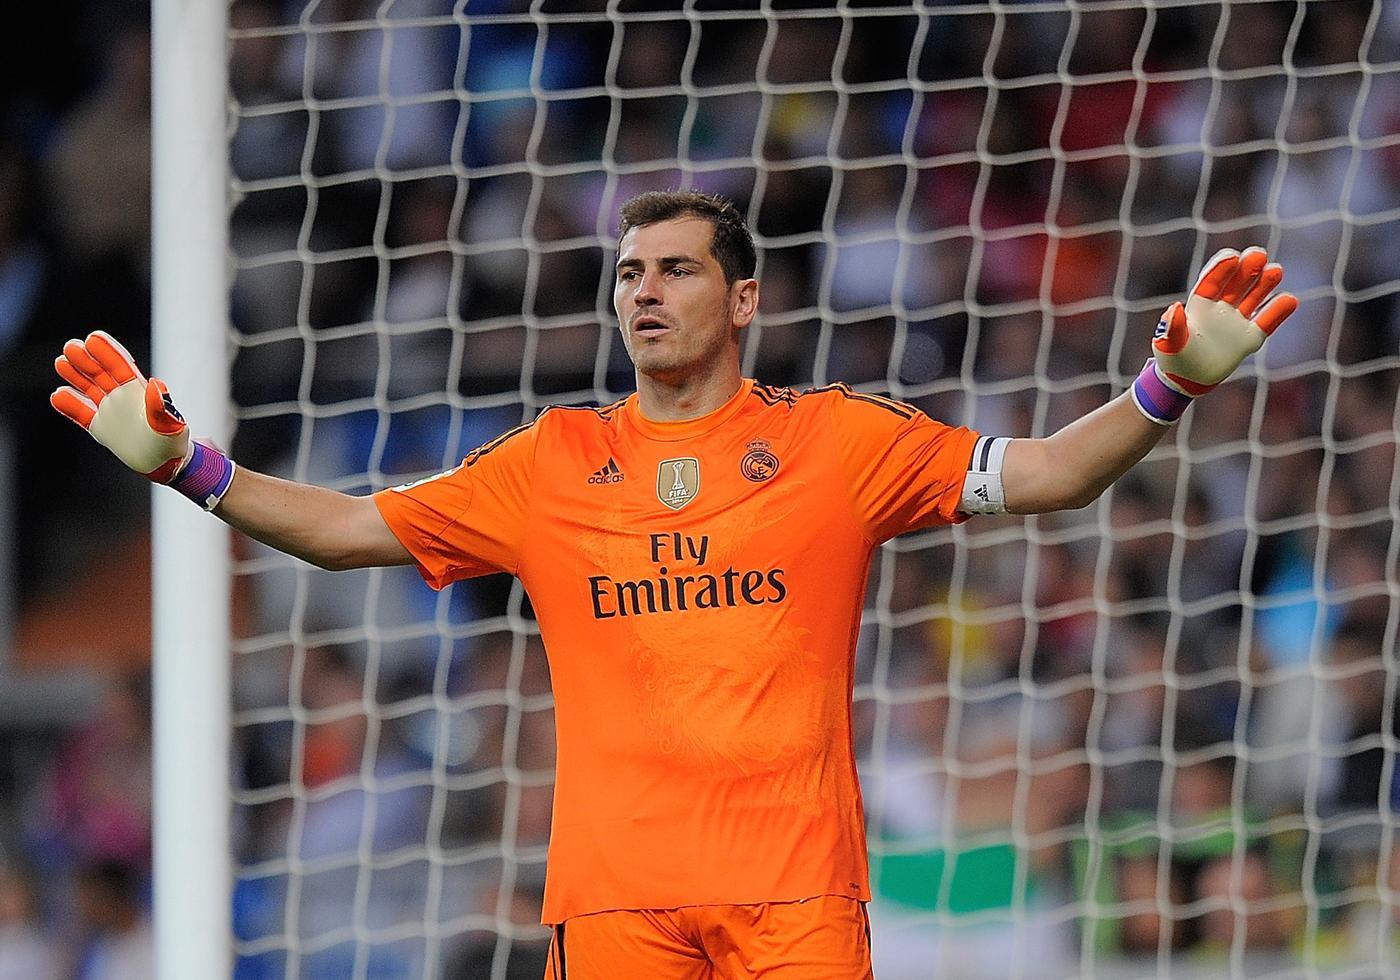 Liverpool 'eye transfer of Real Madrid stopper Iker Casillas'